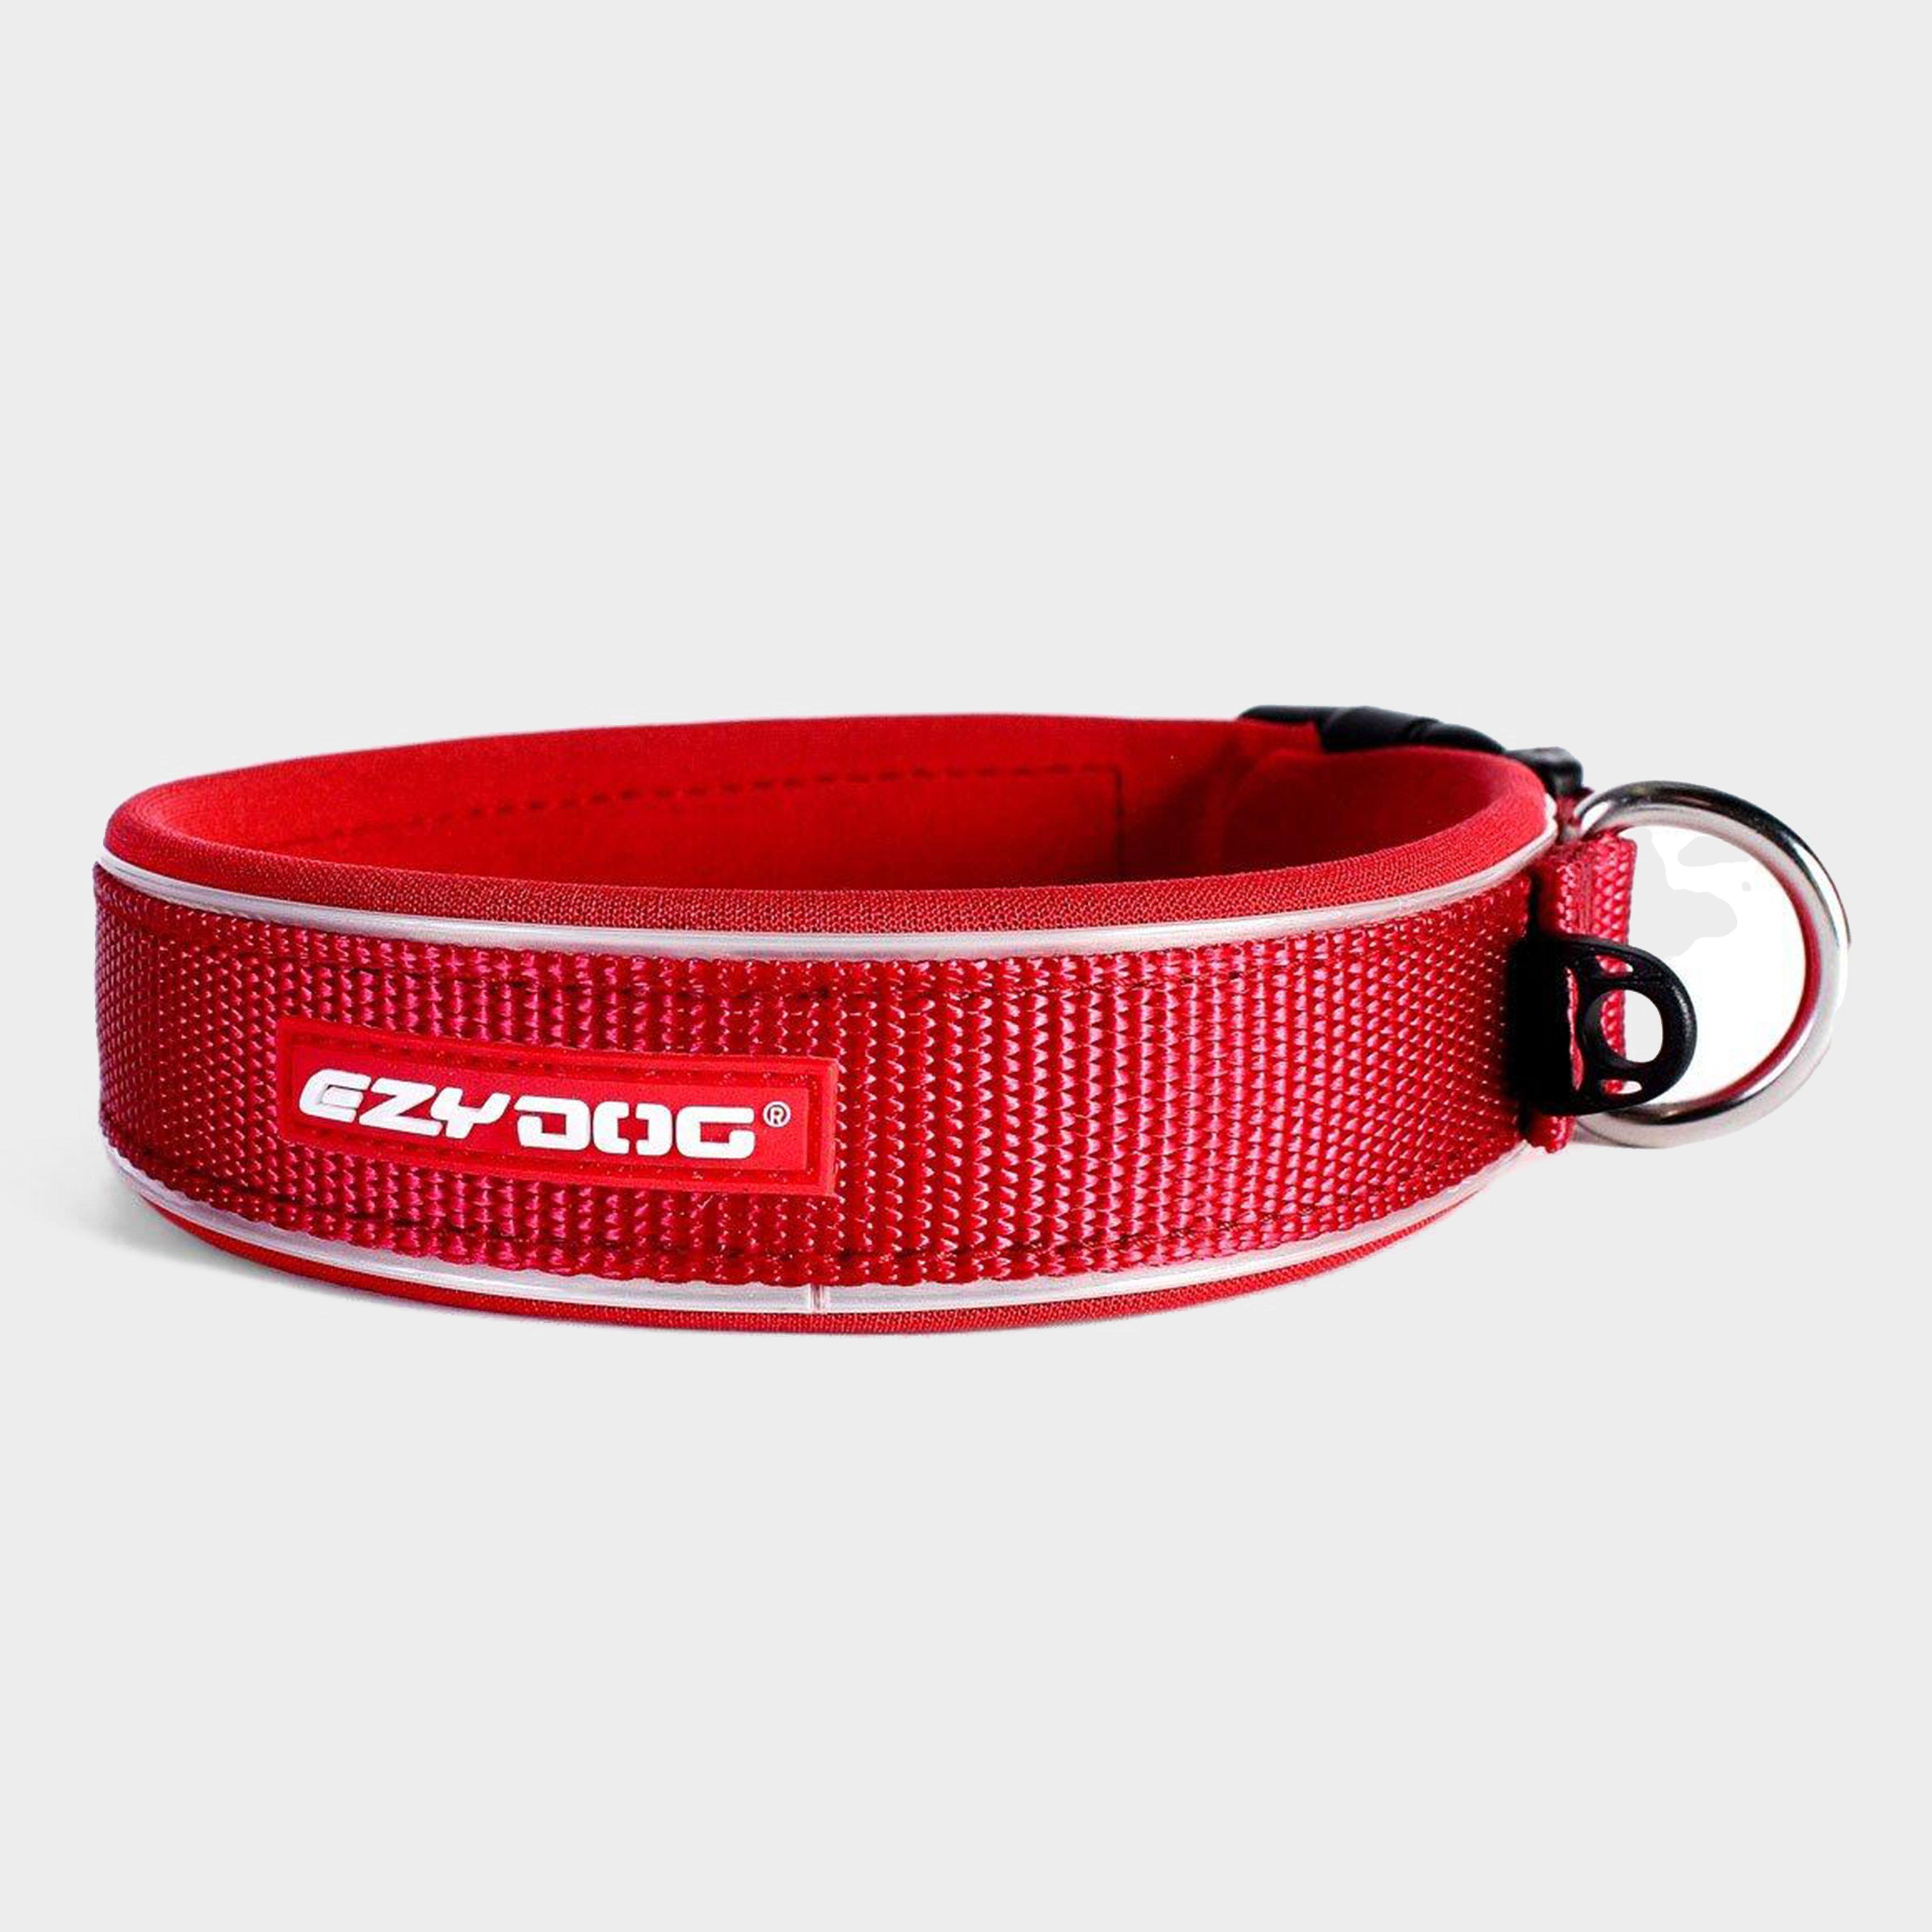 Image of Ezy-Dog Neo Classic Collar (Medium) - Red/M, Red/M